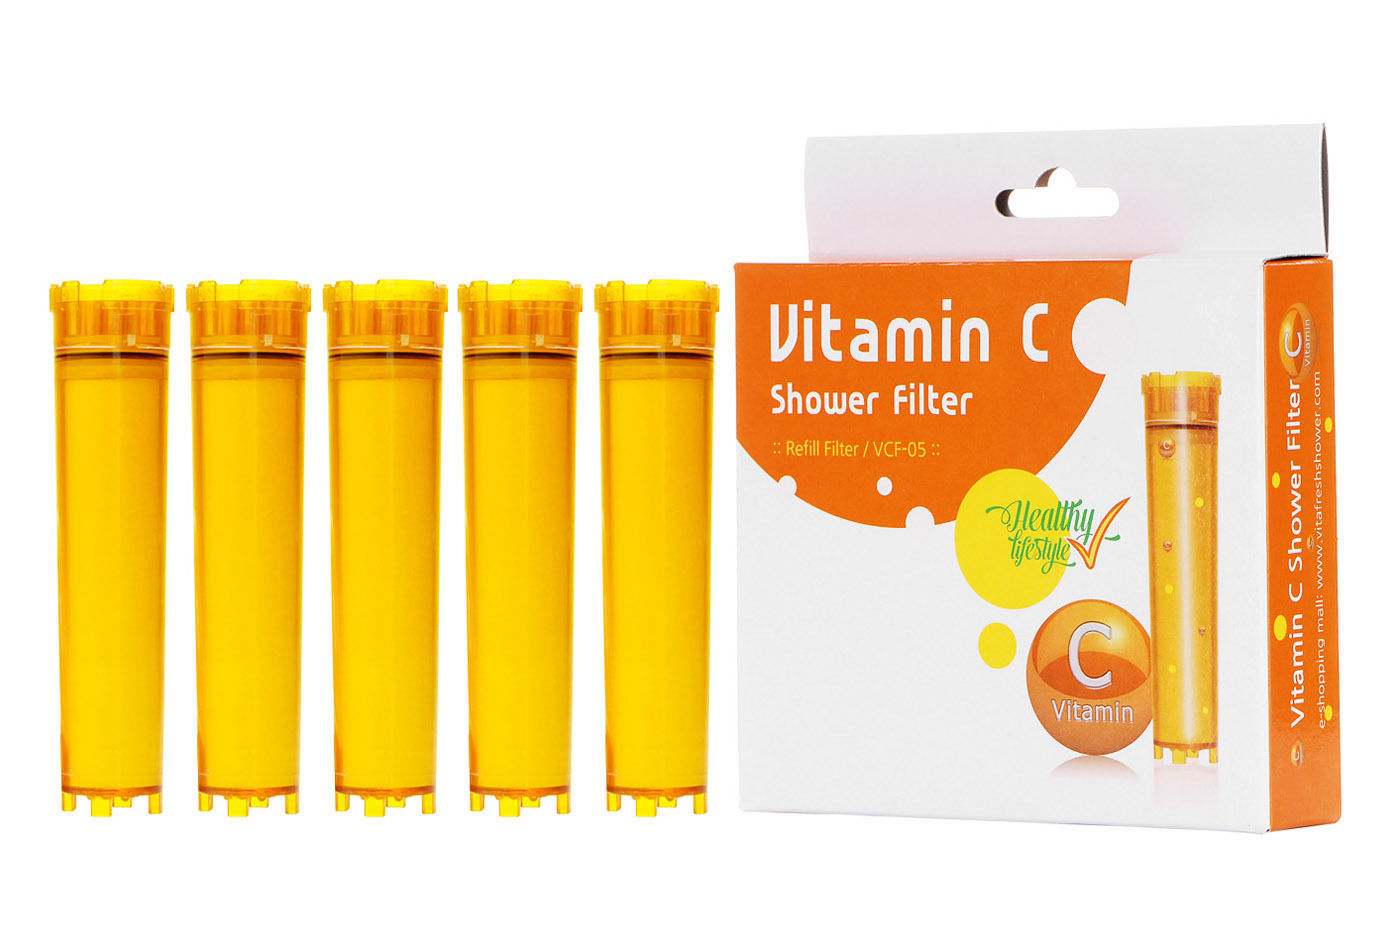 luxury vita fresh shower filter with 7 vitamin c cartridge vitamin shower water. Black Bedroom Furniture Sets. Home Design Ideas